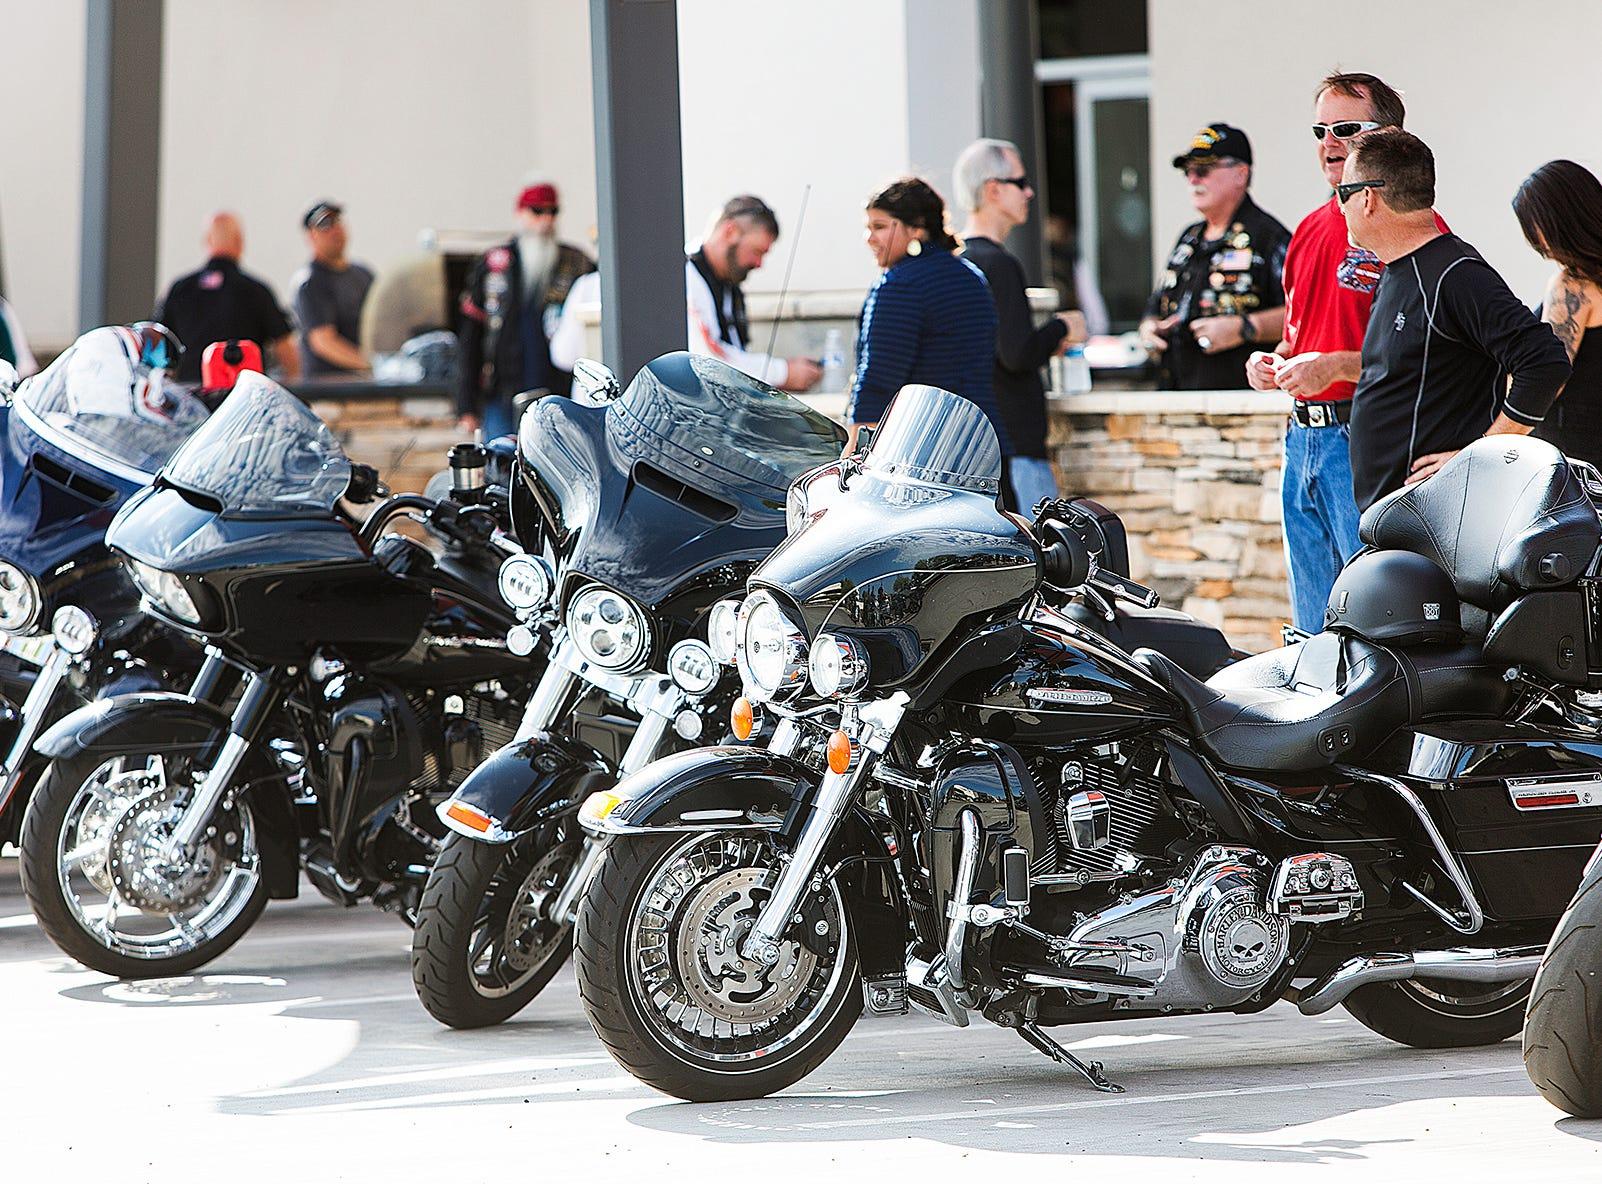 Riders gather outside the Harley-Davidson dealership in Scottsdale, Arizona, Aug. 22.